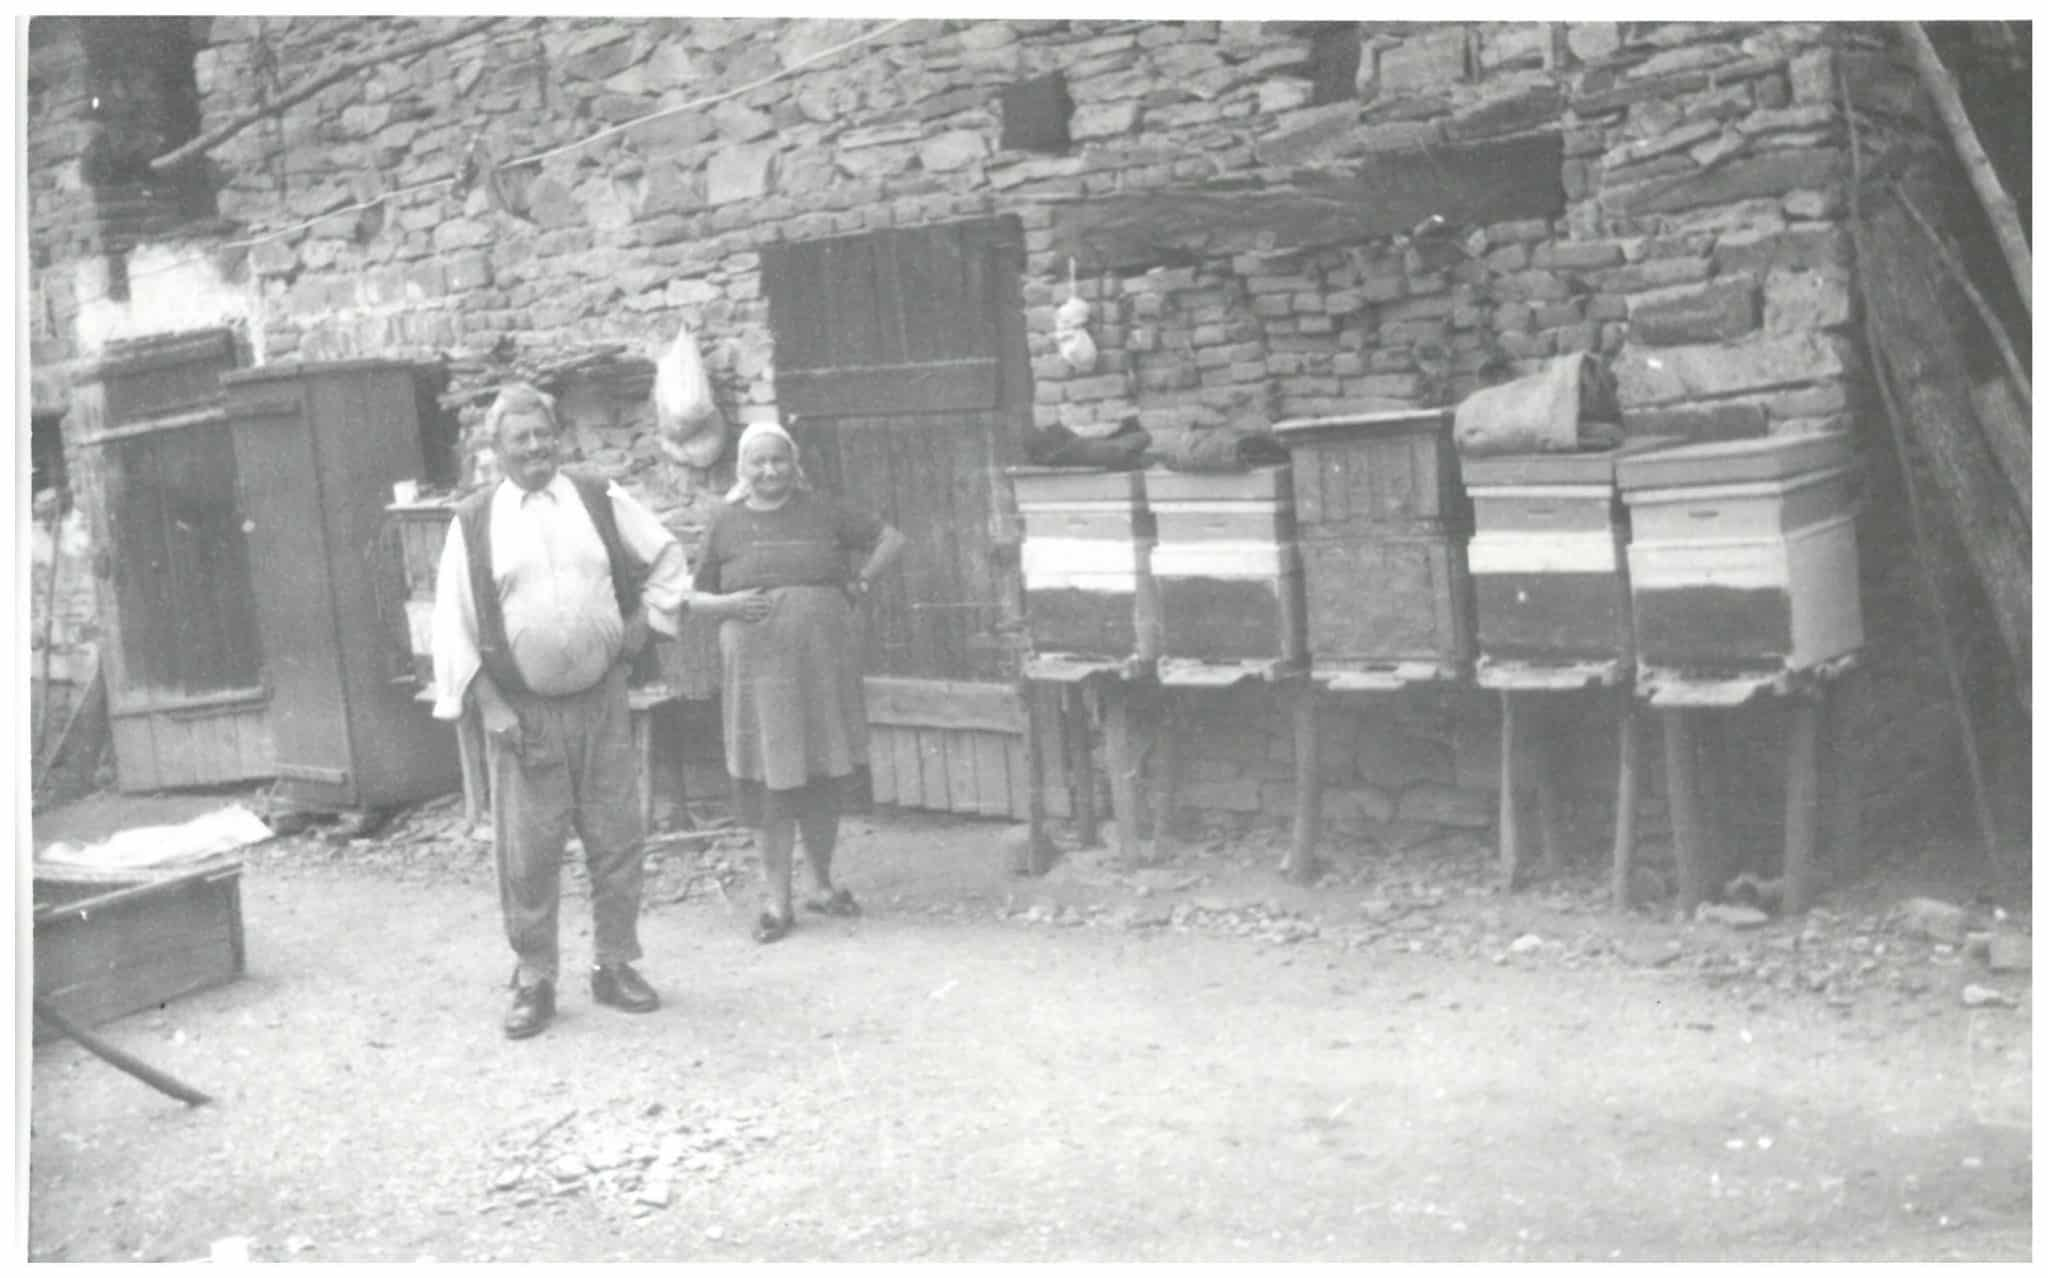 43489 Stupina actuala comuna Parau judetul Brasov scaled